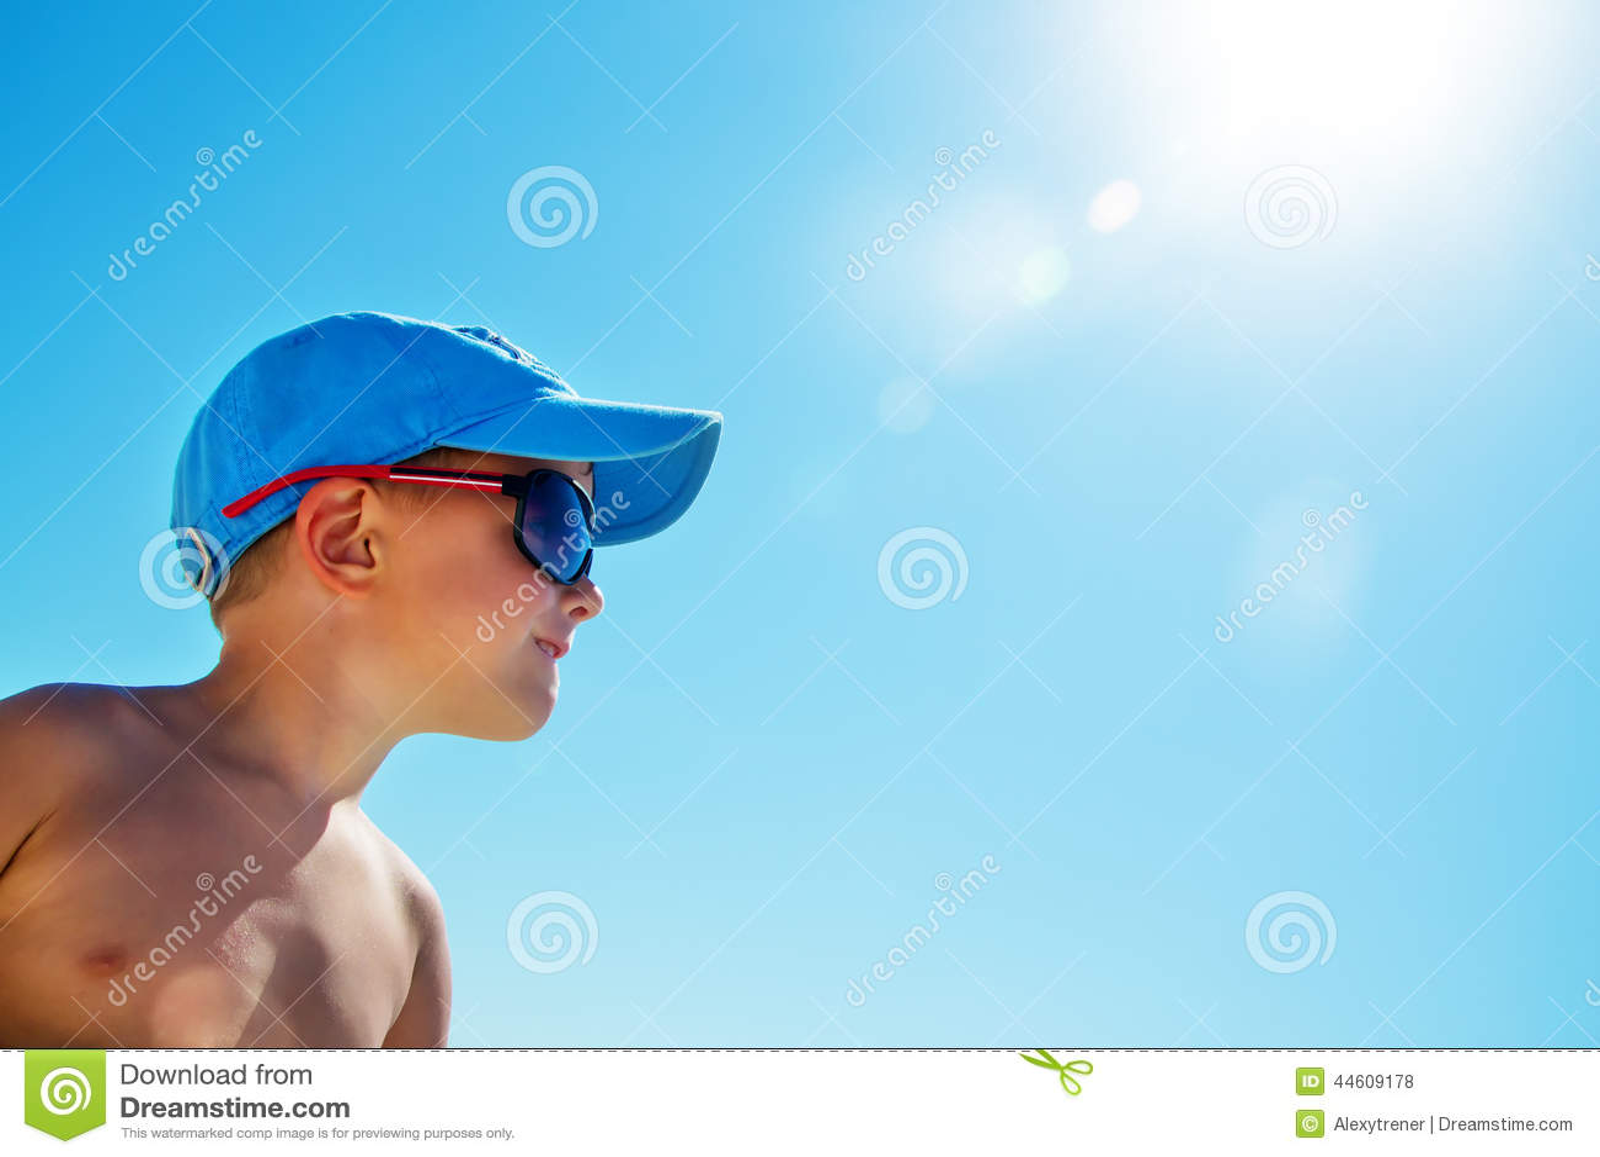 96d10268976c Beautiful Child Wearing Blue Cap On Beach Stock Photo - Image of ...